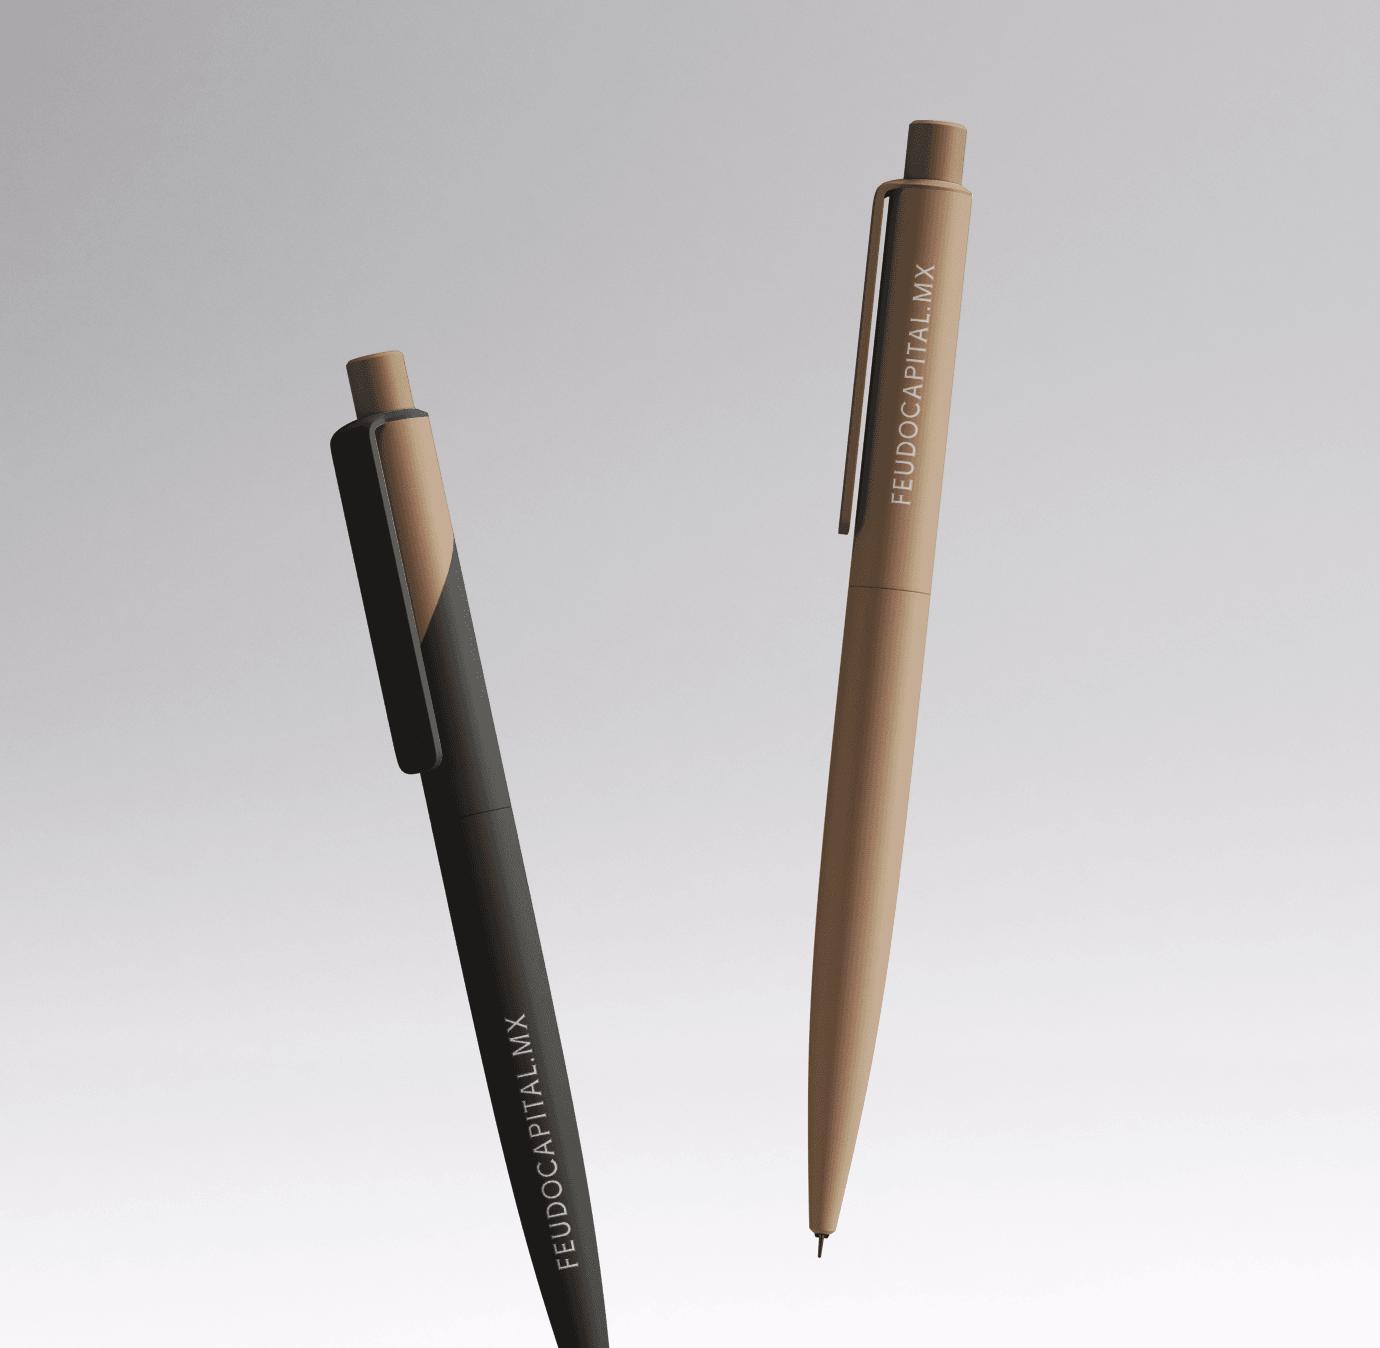 floating-pens-feudo-capital-yoenpaperland-compressor